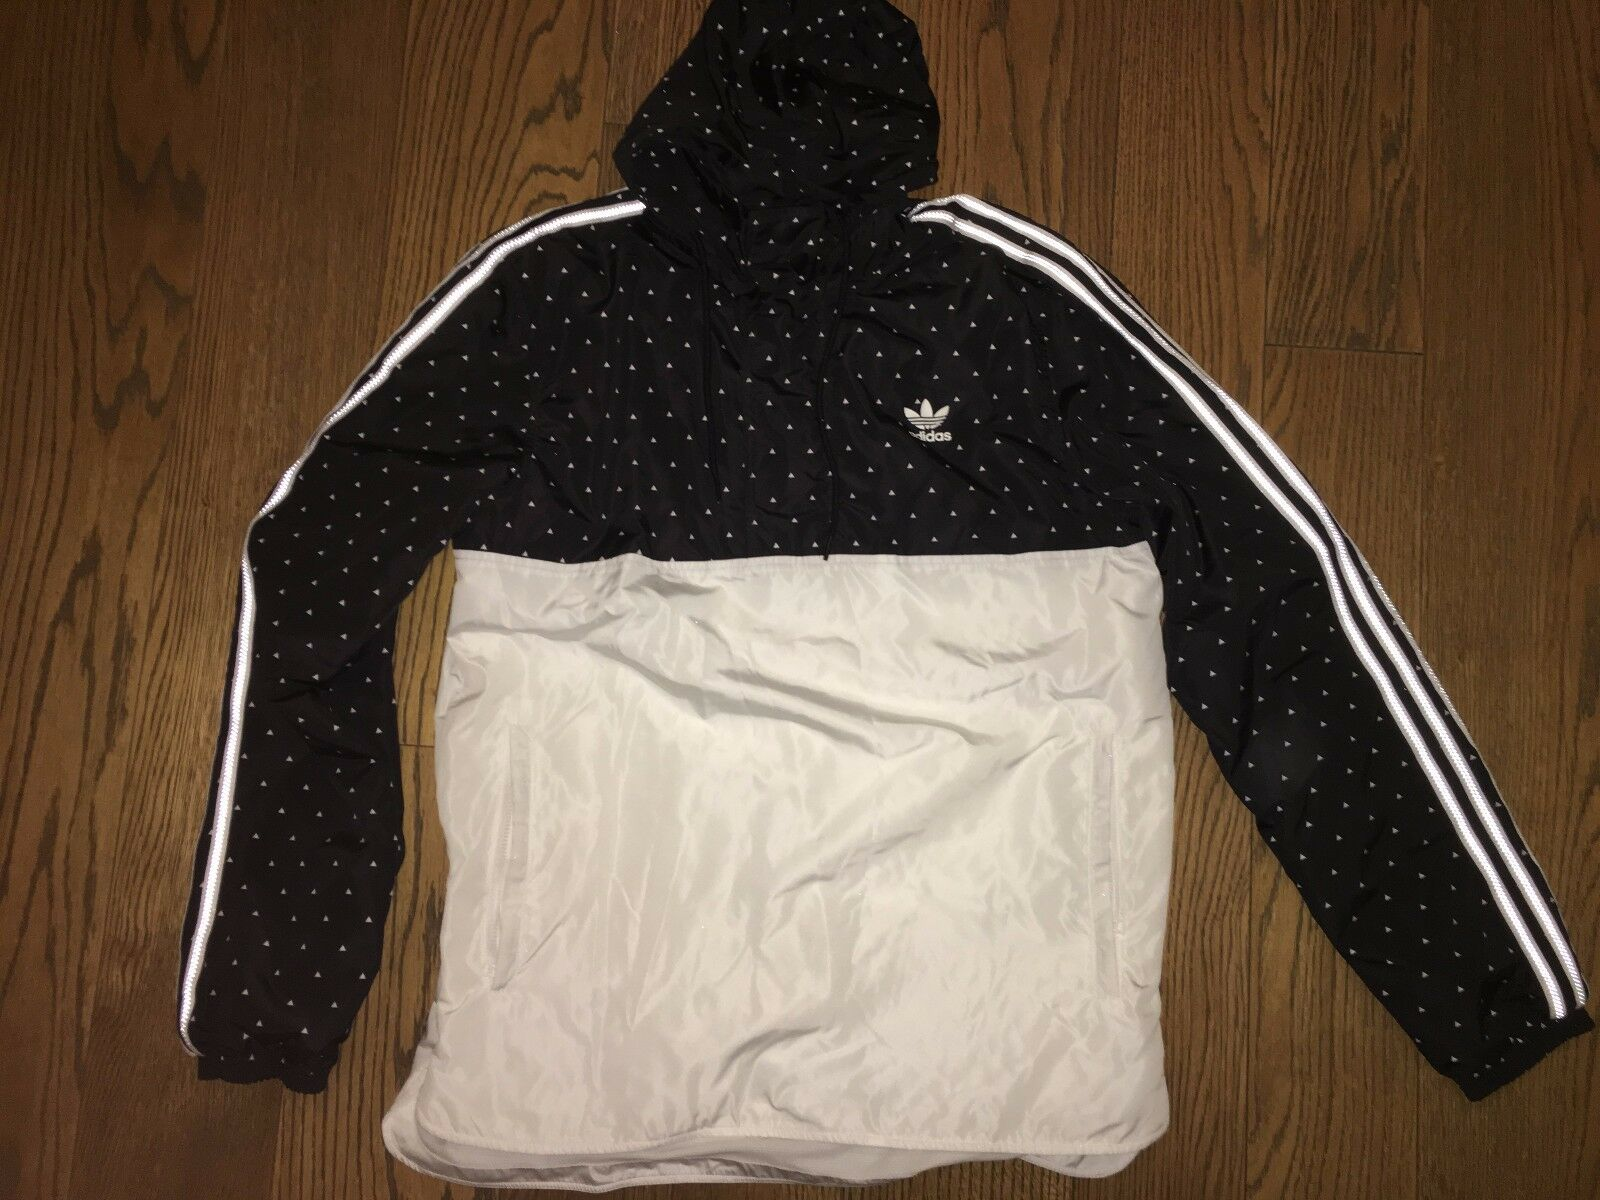 Adidas x Pharrell Williams HU Human Race Jacket Sz:XS Woven Hoodie BR1823 Rare